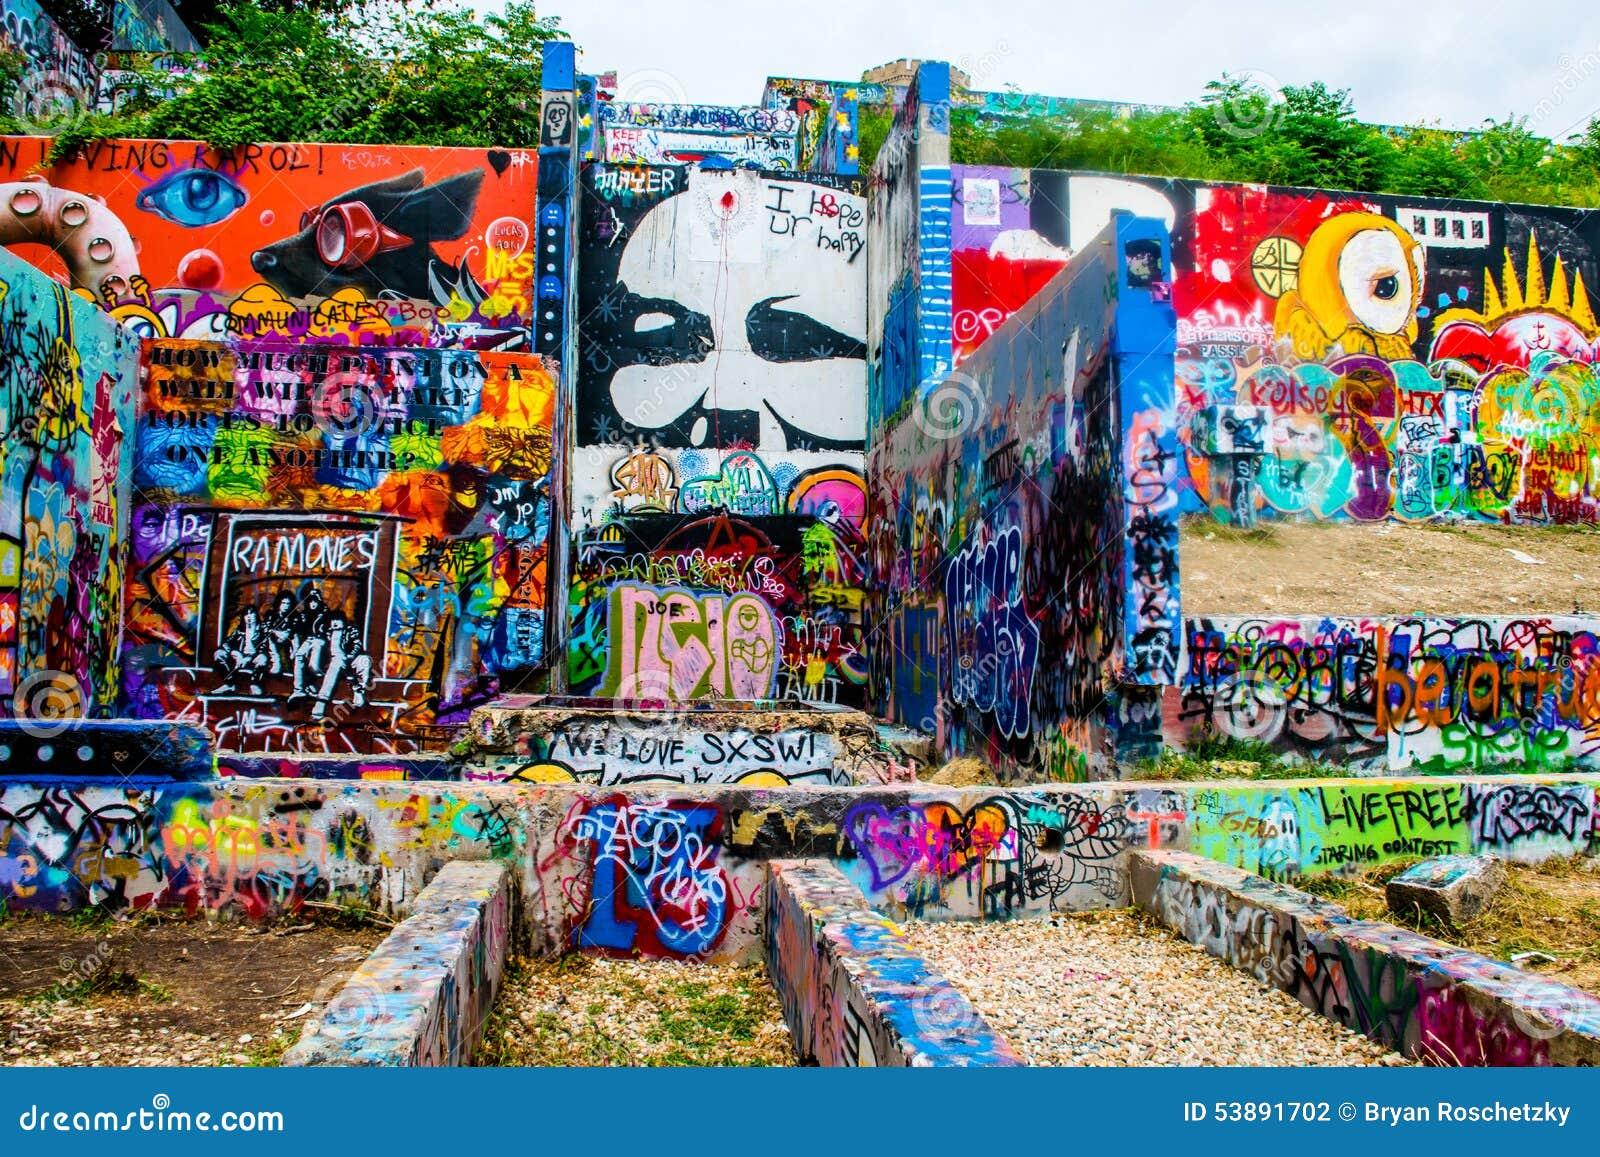 Painting Ideas Central Park